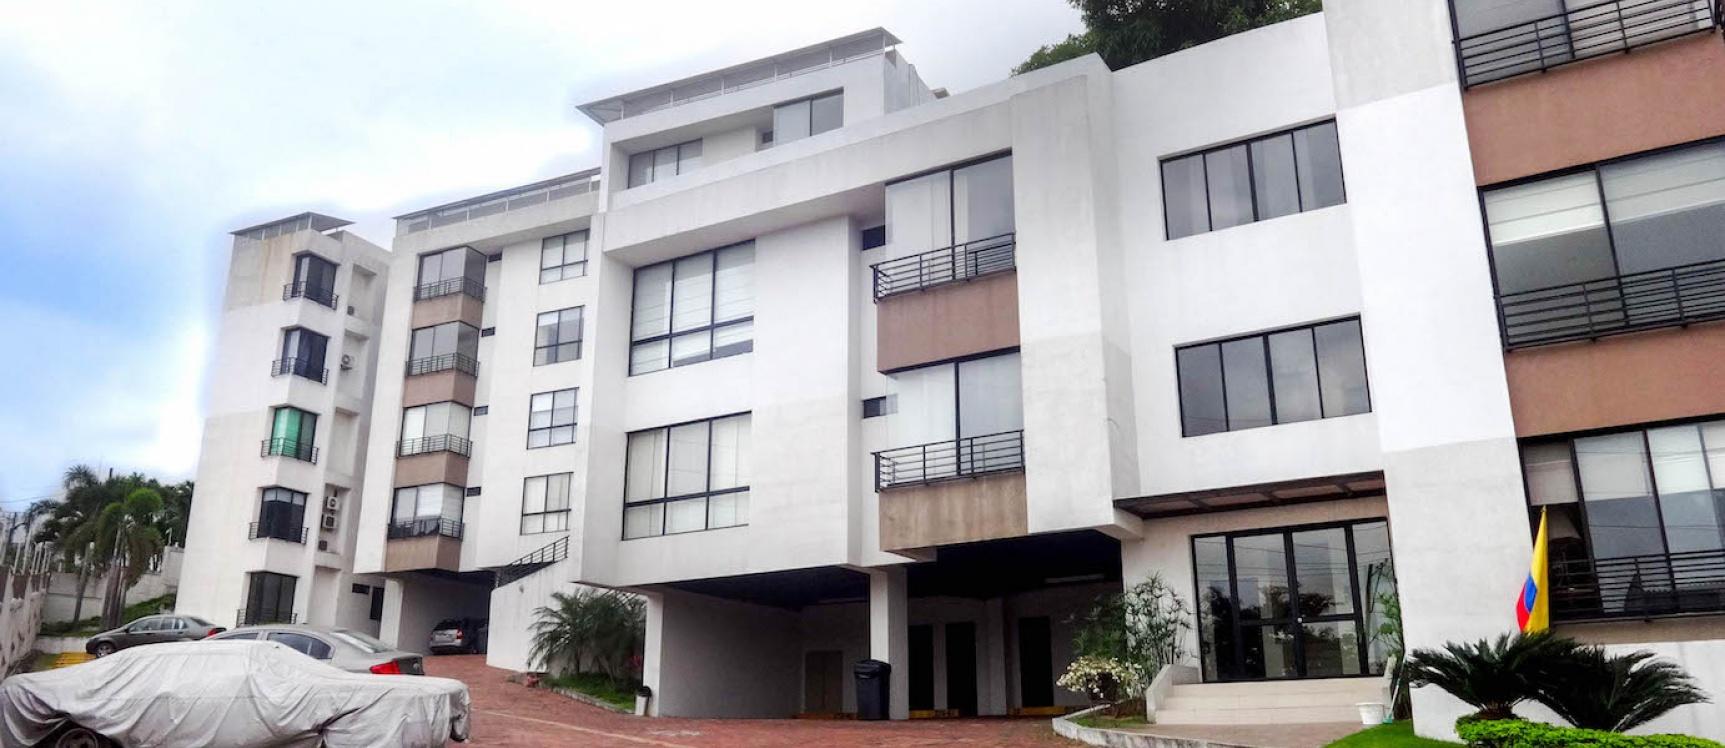 Departamento En Alquiler En Lomas De Urdesa Guayaquil